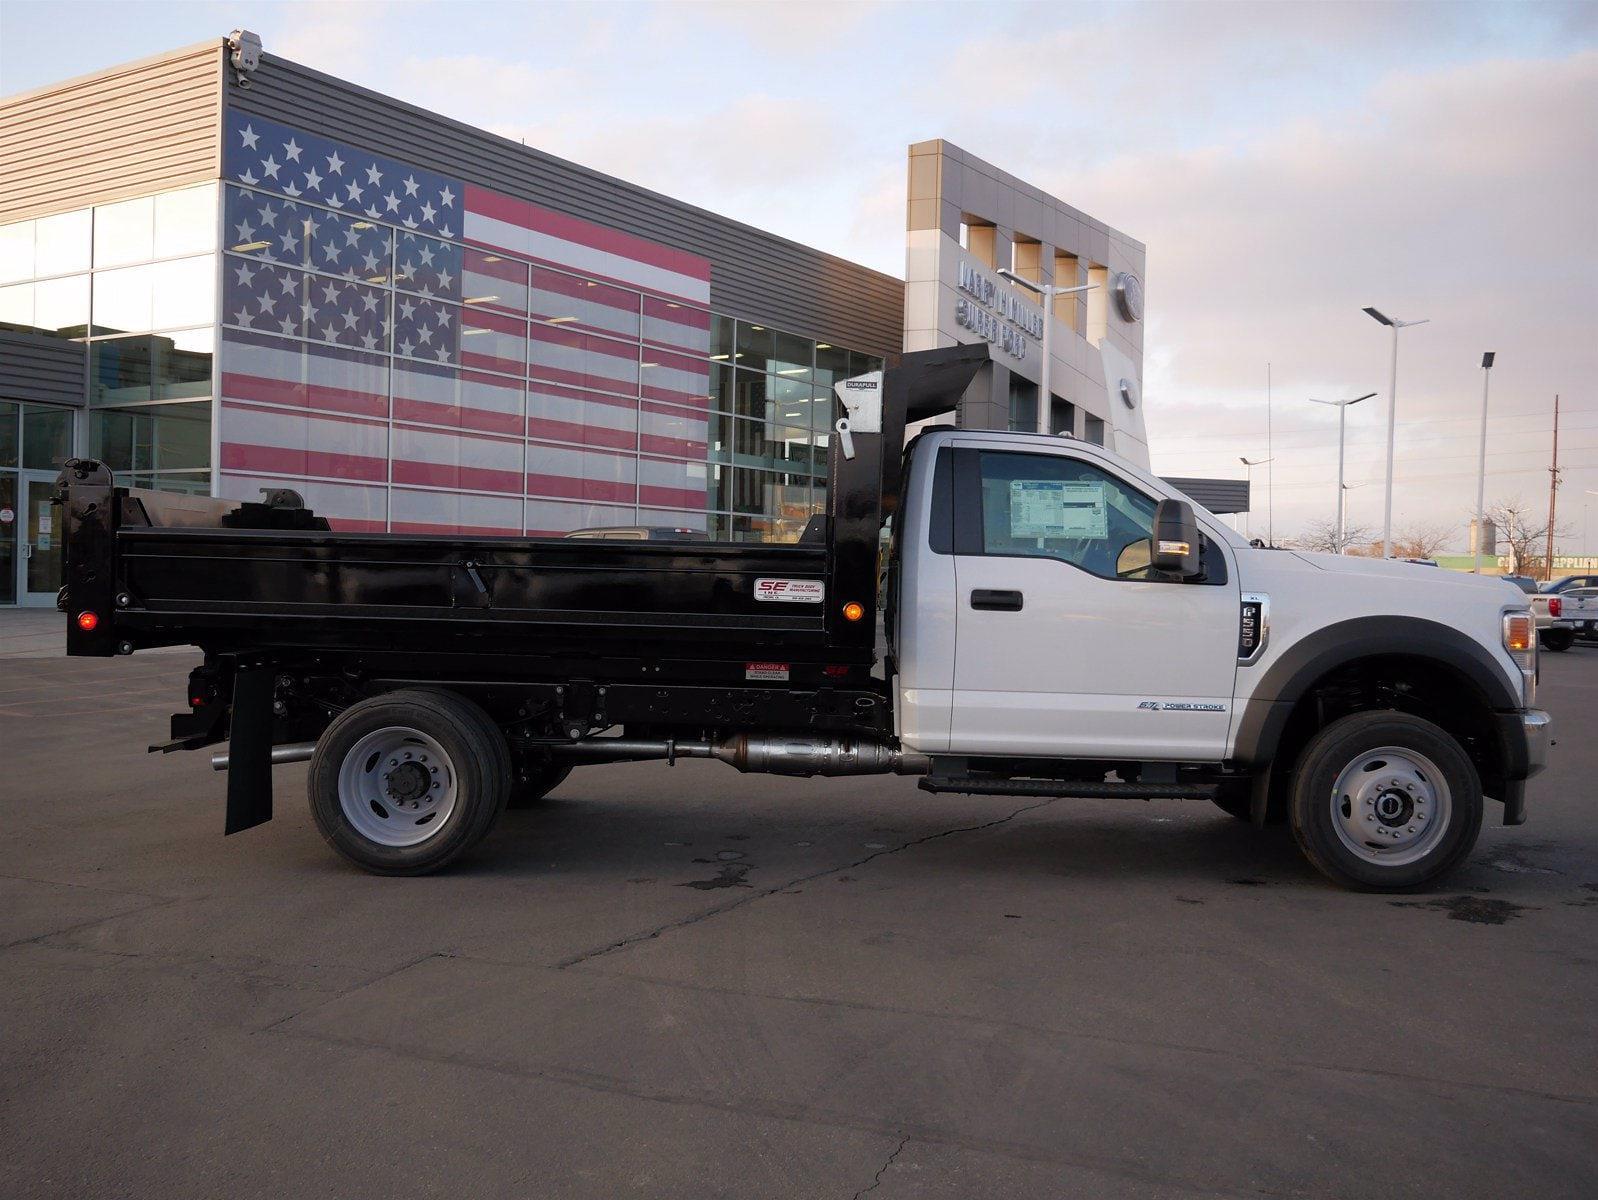 2020 Ford F-550 Regular Cab DRW 4x4, Scelzi Dump Body #63233 - photo 3